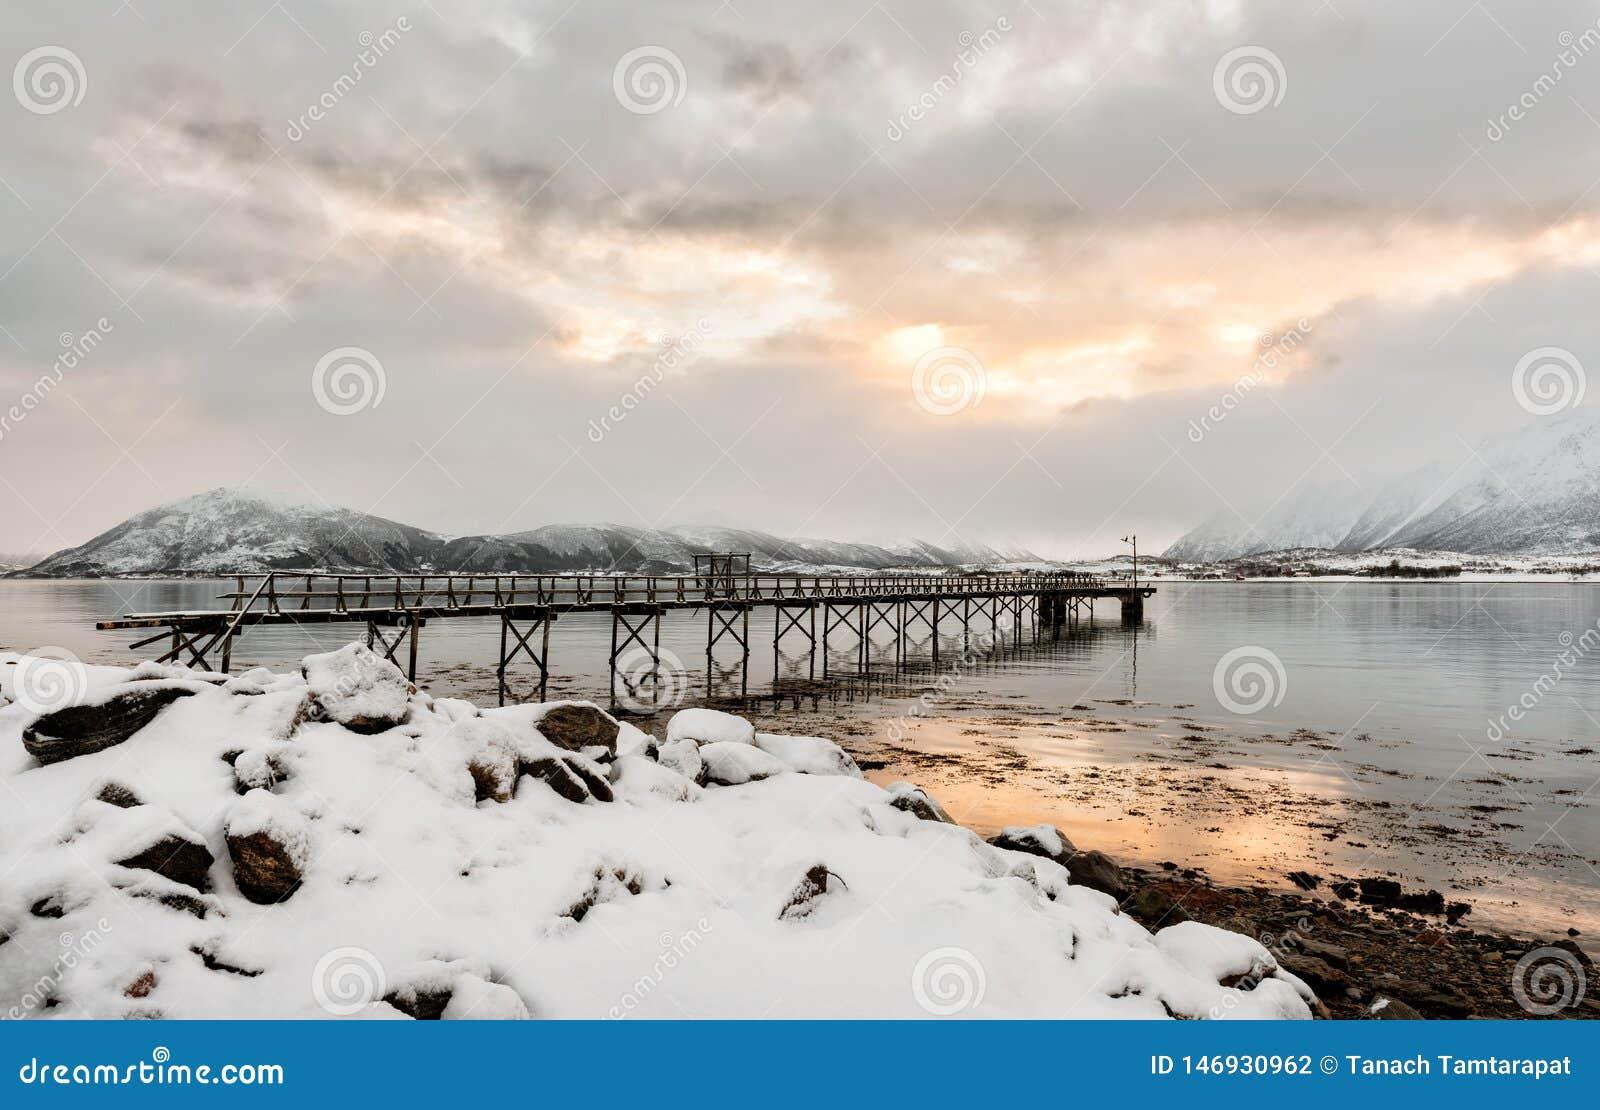 The iron bridge is protruding into the sea